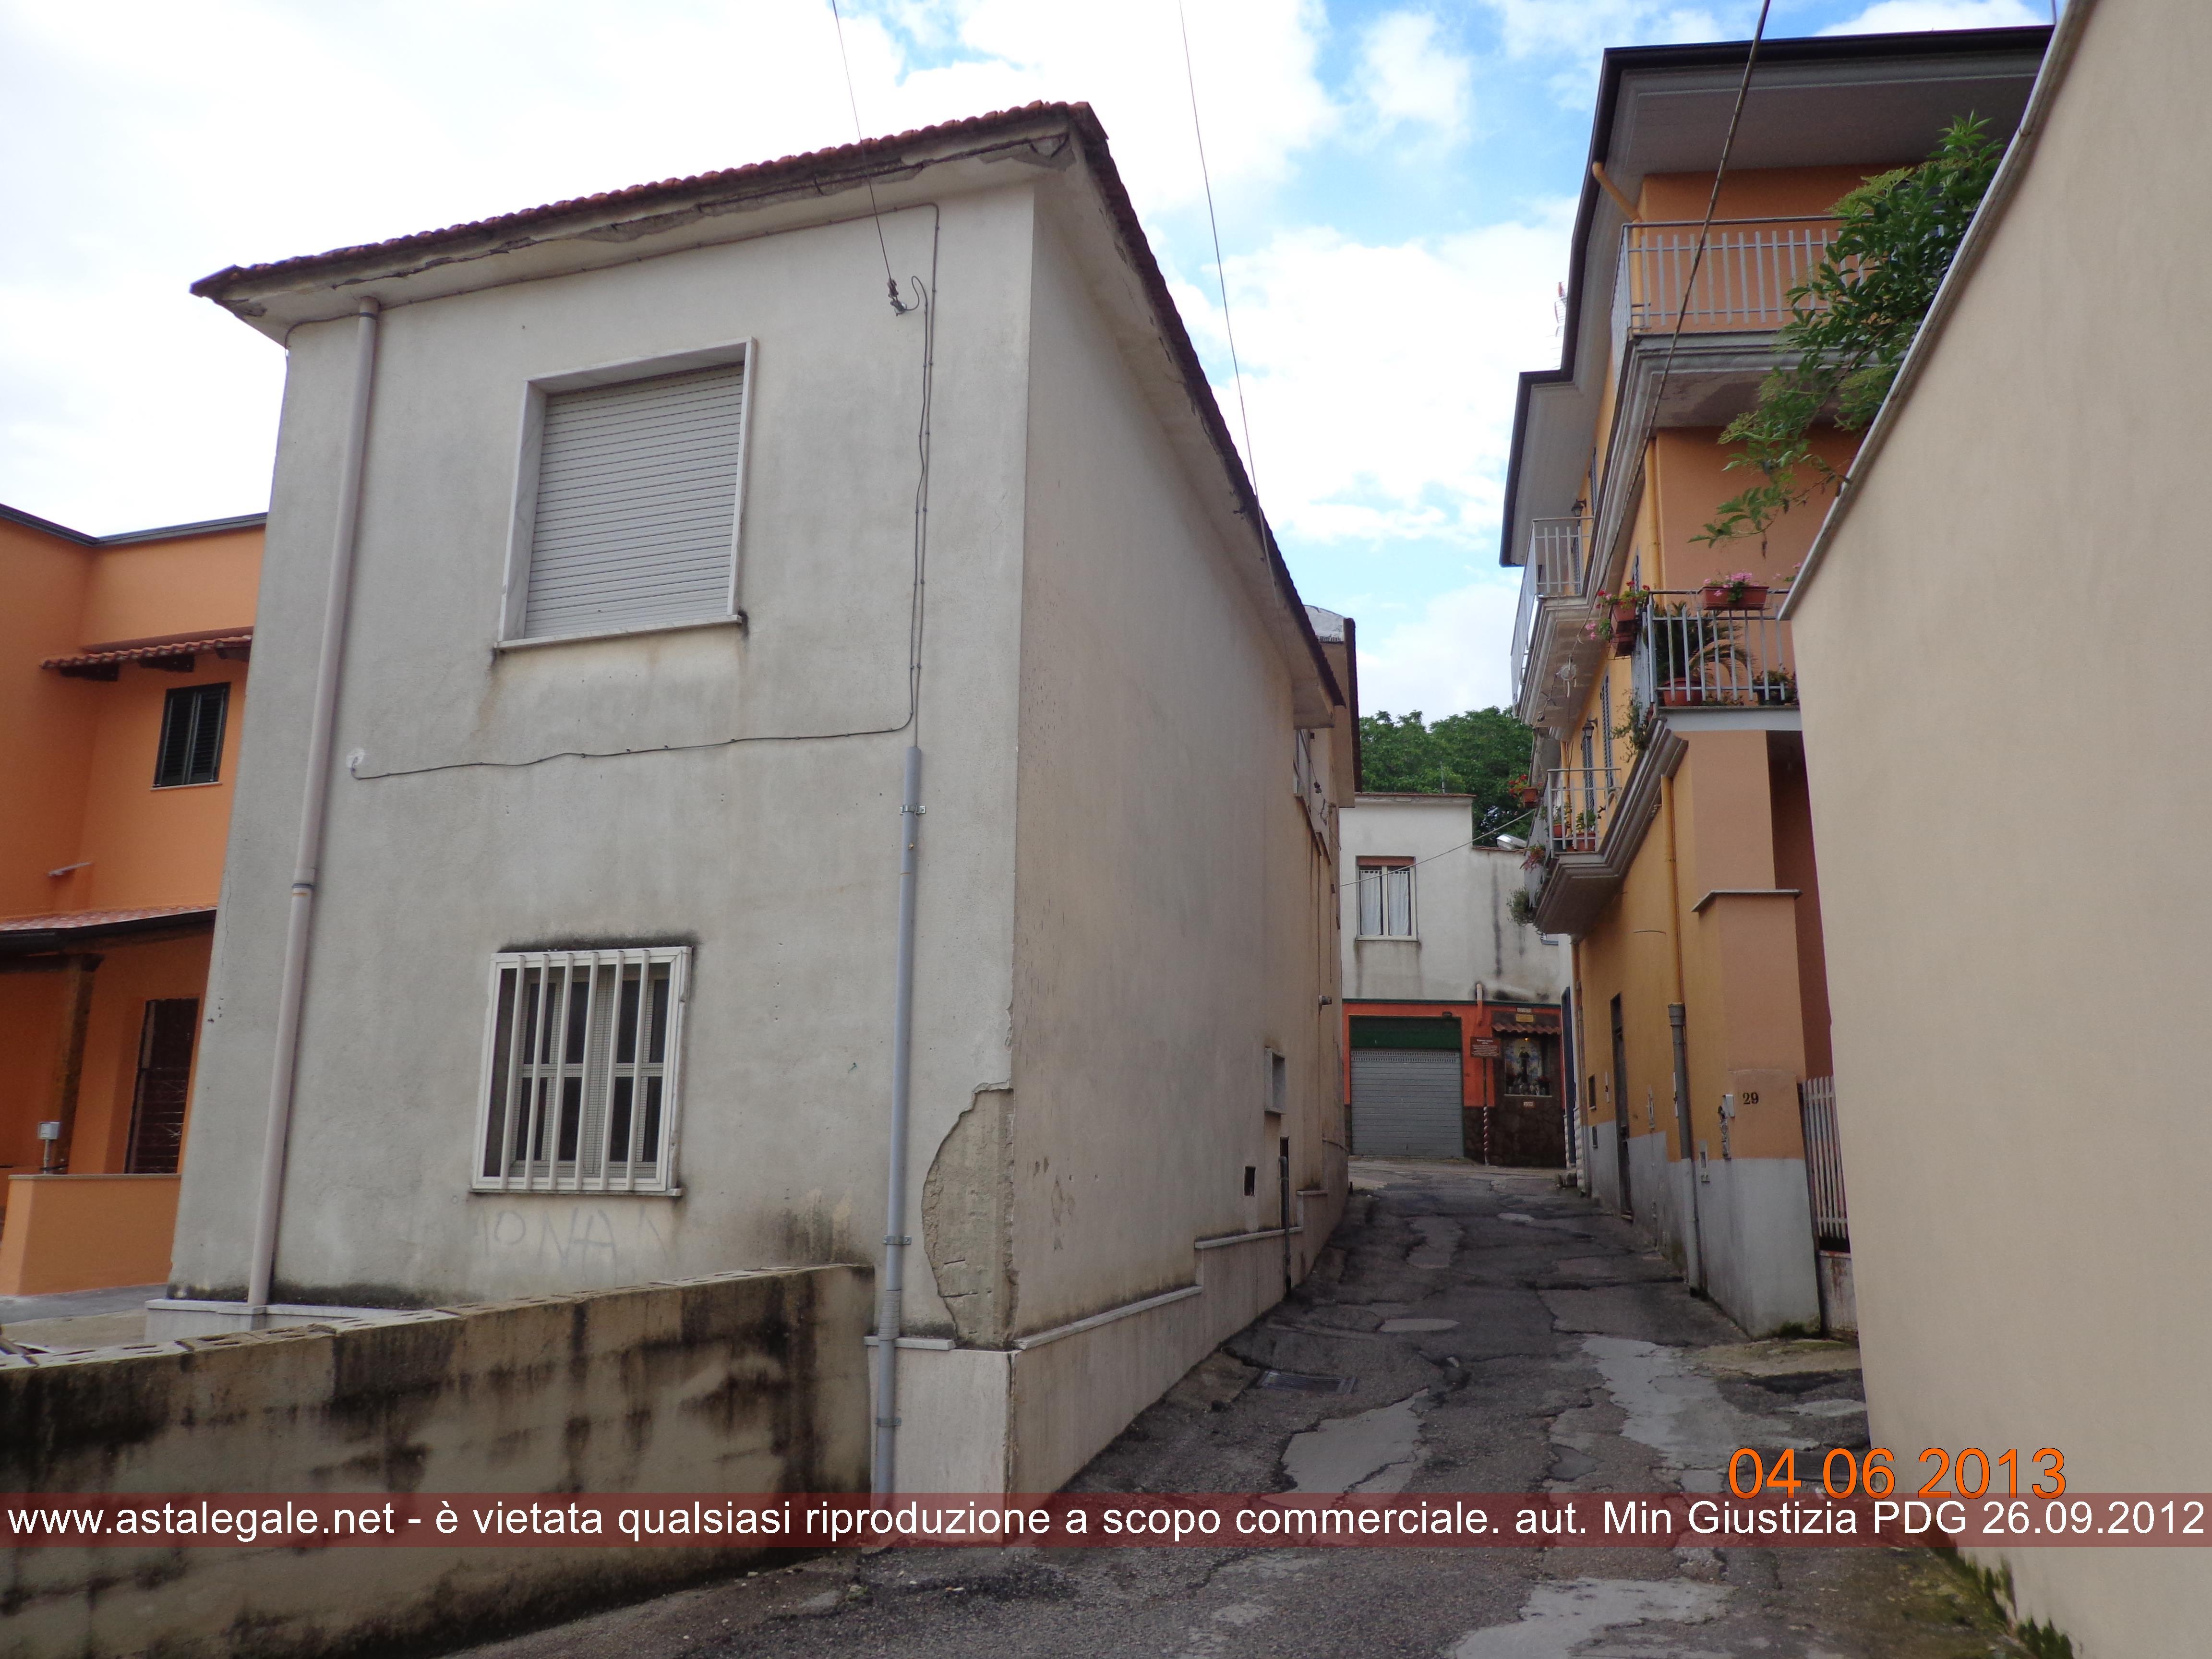 Sirignano (AV) Via G. Marconi 58